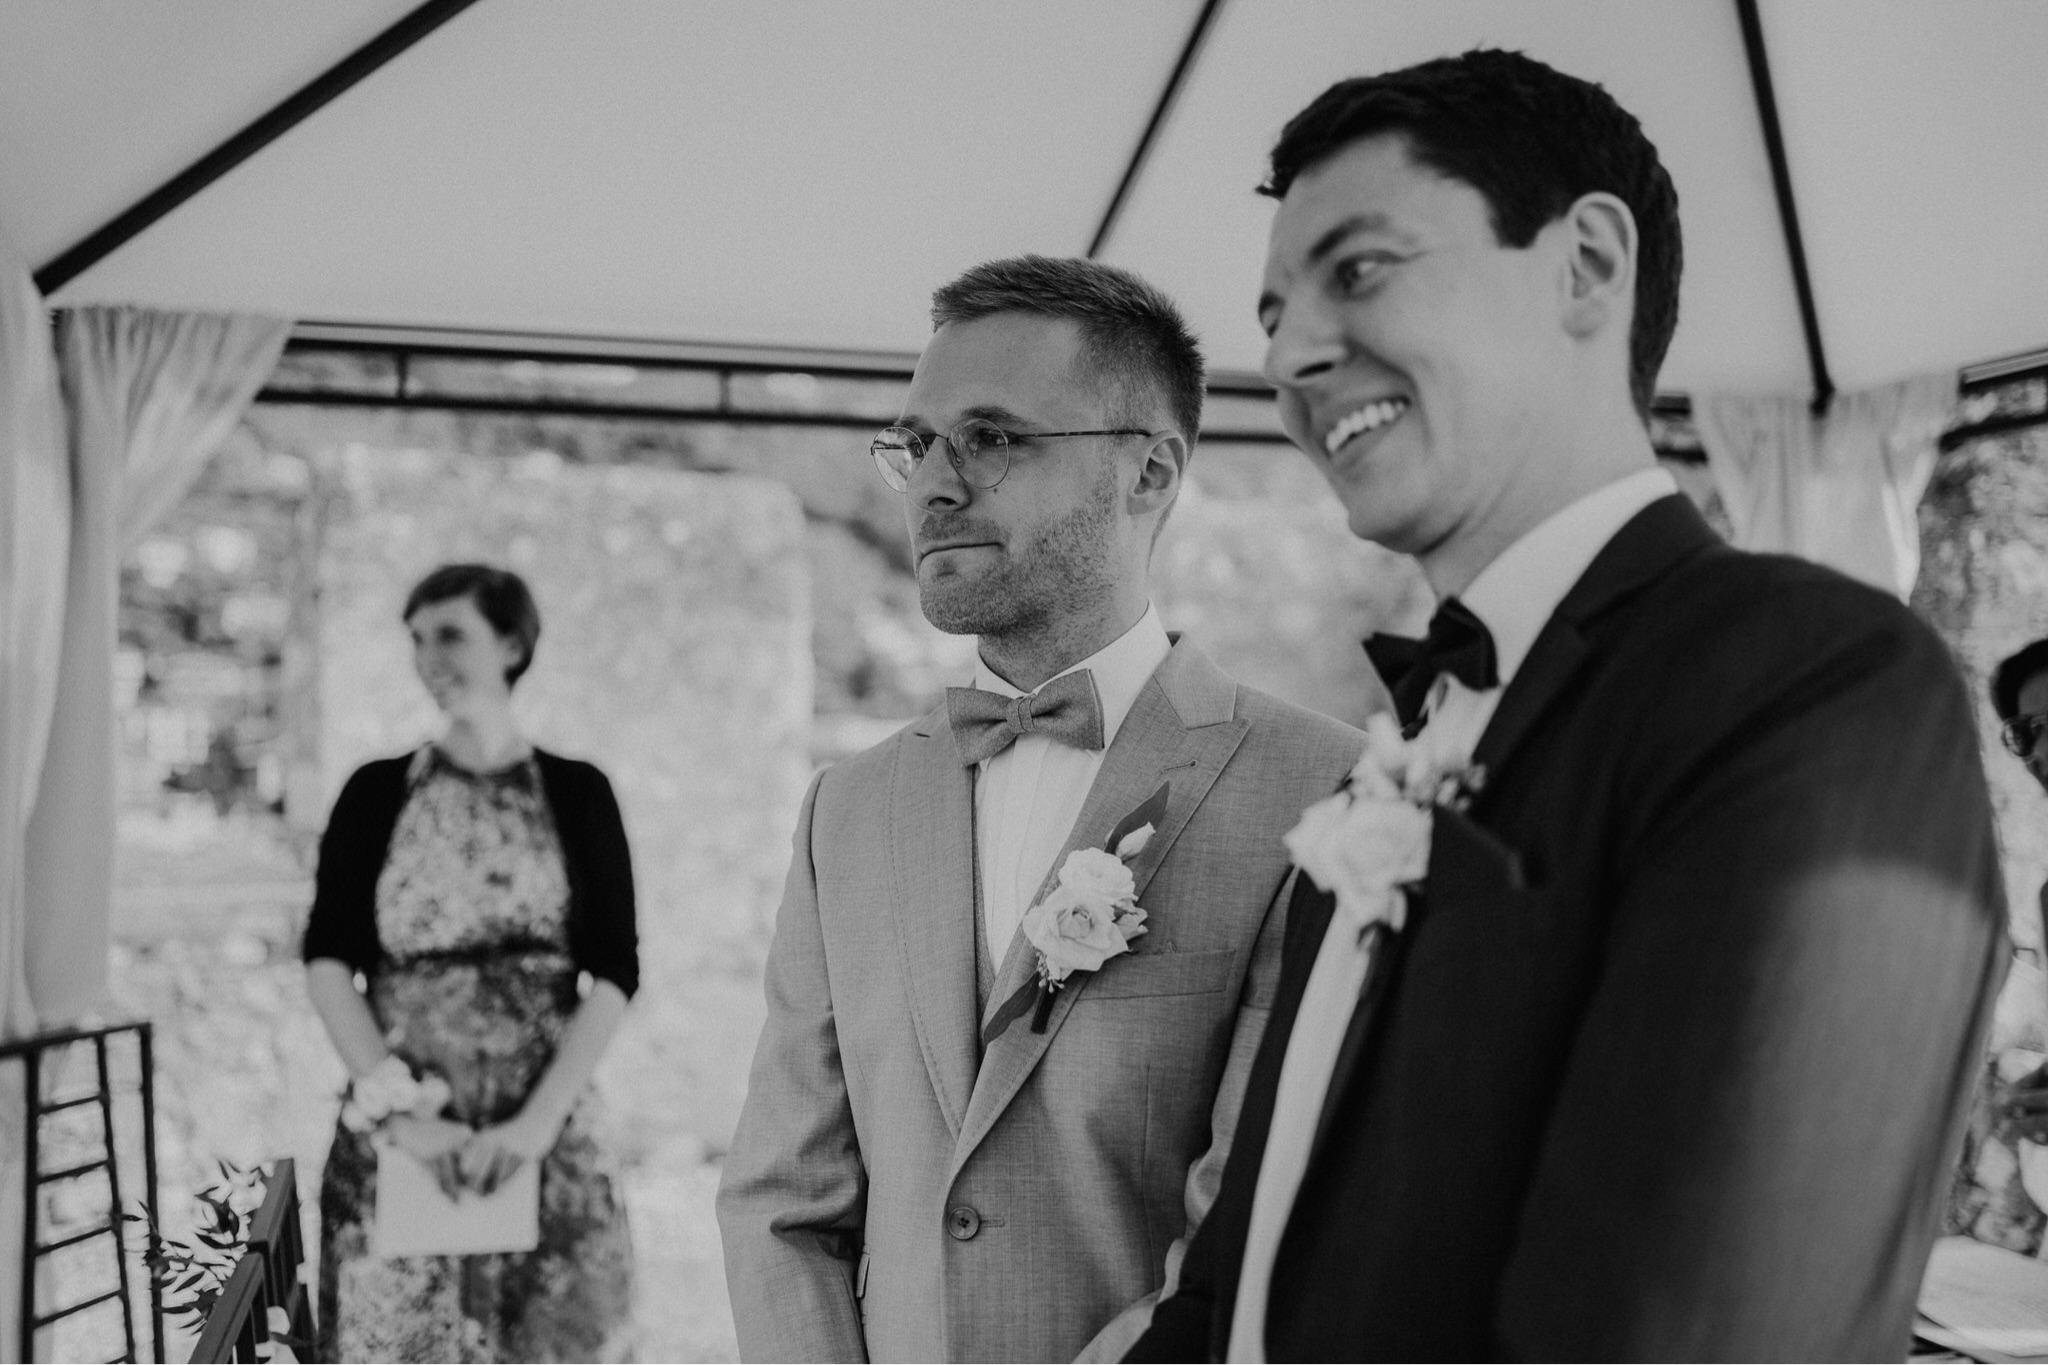 35 la 03 zeremonie 1021 weddinphotographer Hochzeitsfotograf newzealand hamilton Weddingphotography Stuttgart